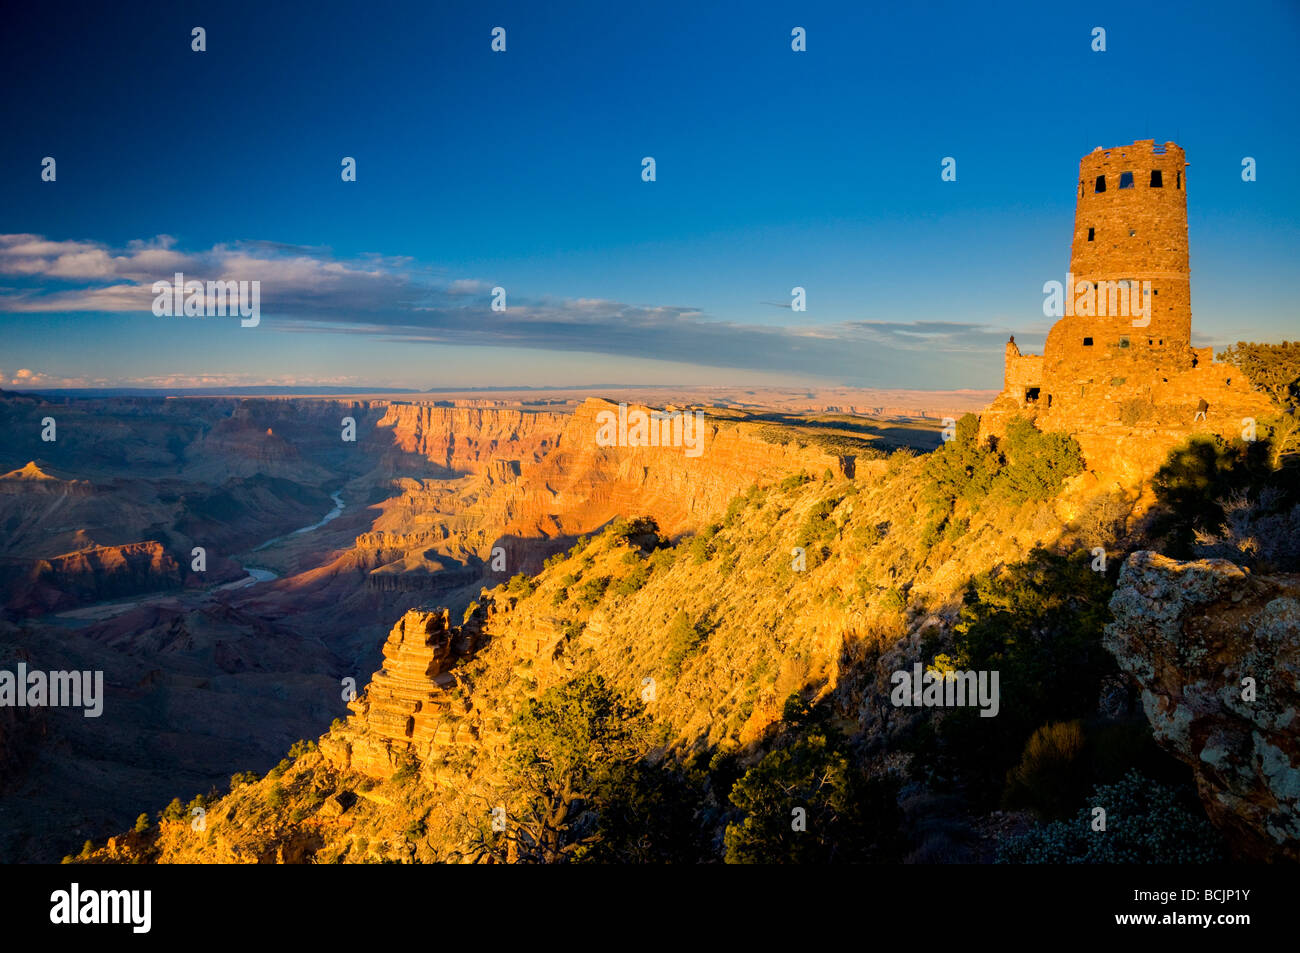 USA, Arizona, Grand Canyon, Desert View Photo Stock